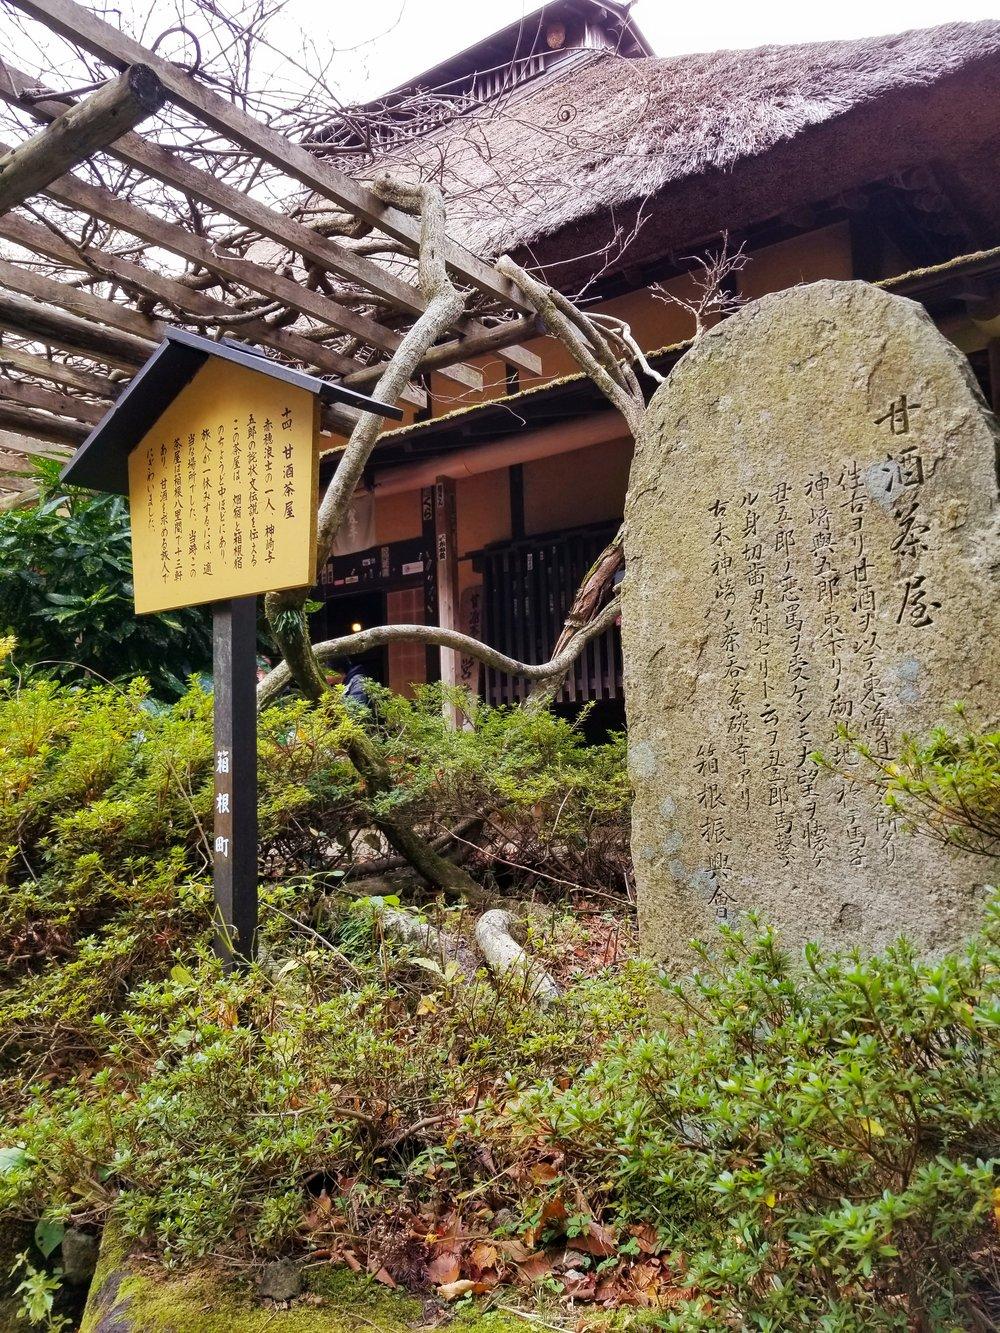 uprooted-traveler-vegan-guide-hakone-amazake-chaya-teahouse